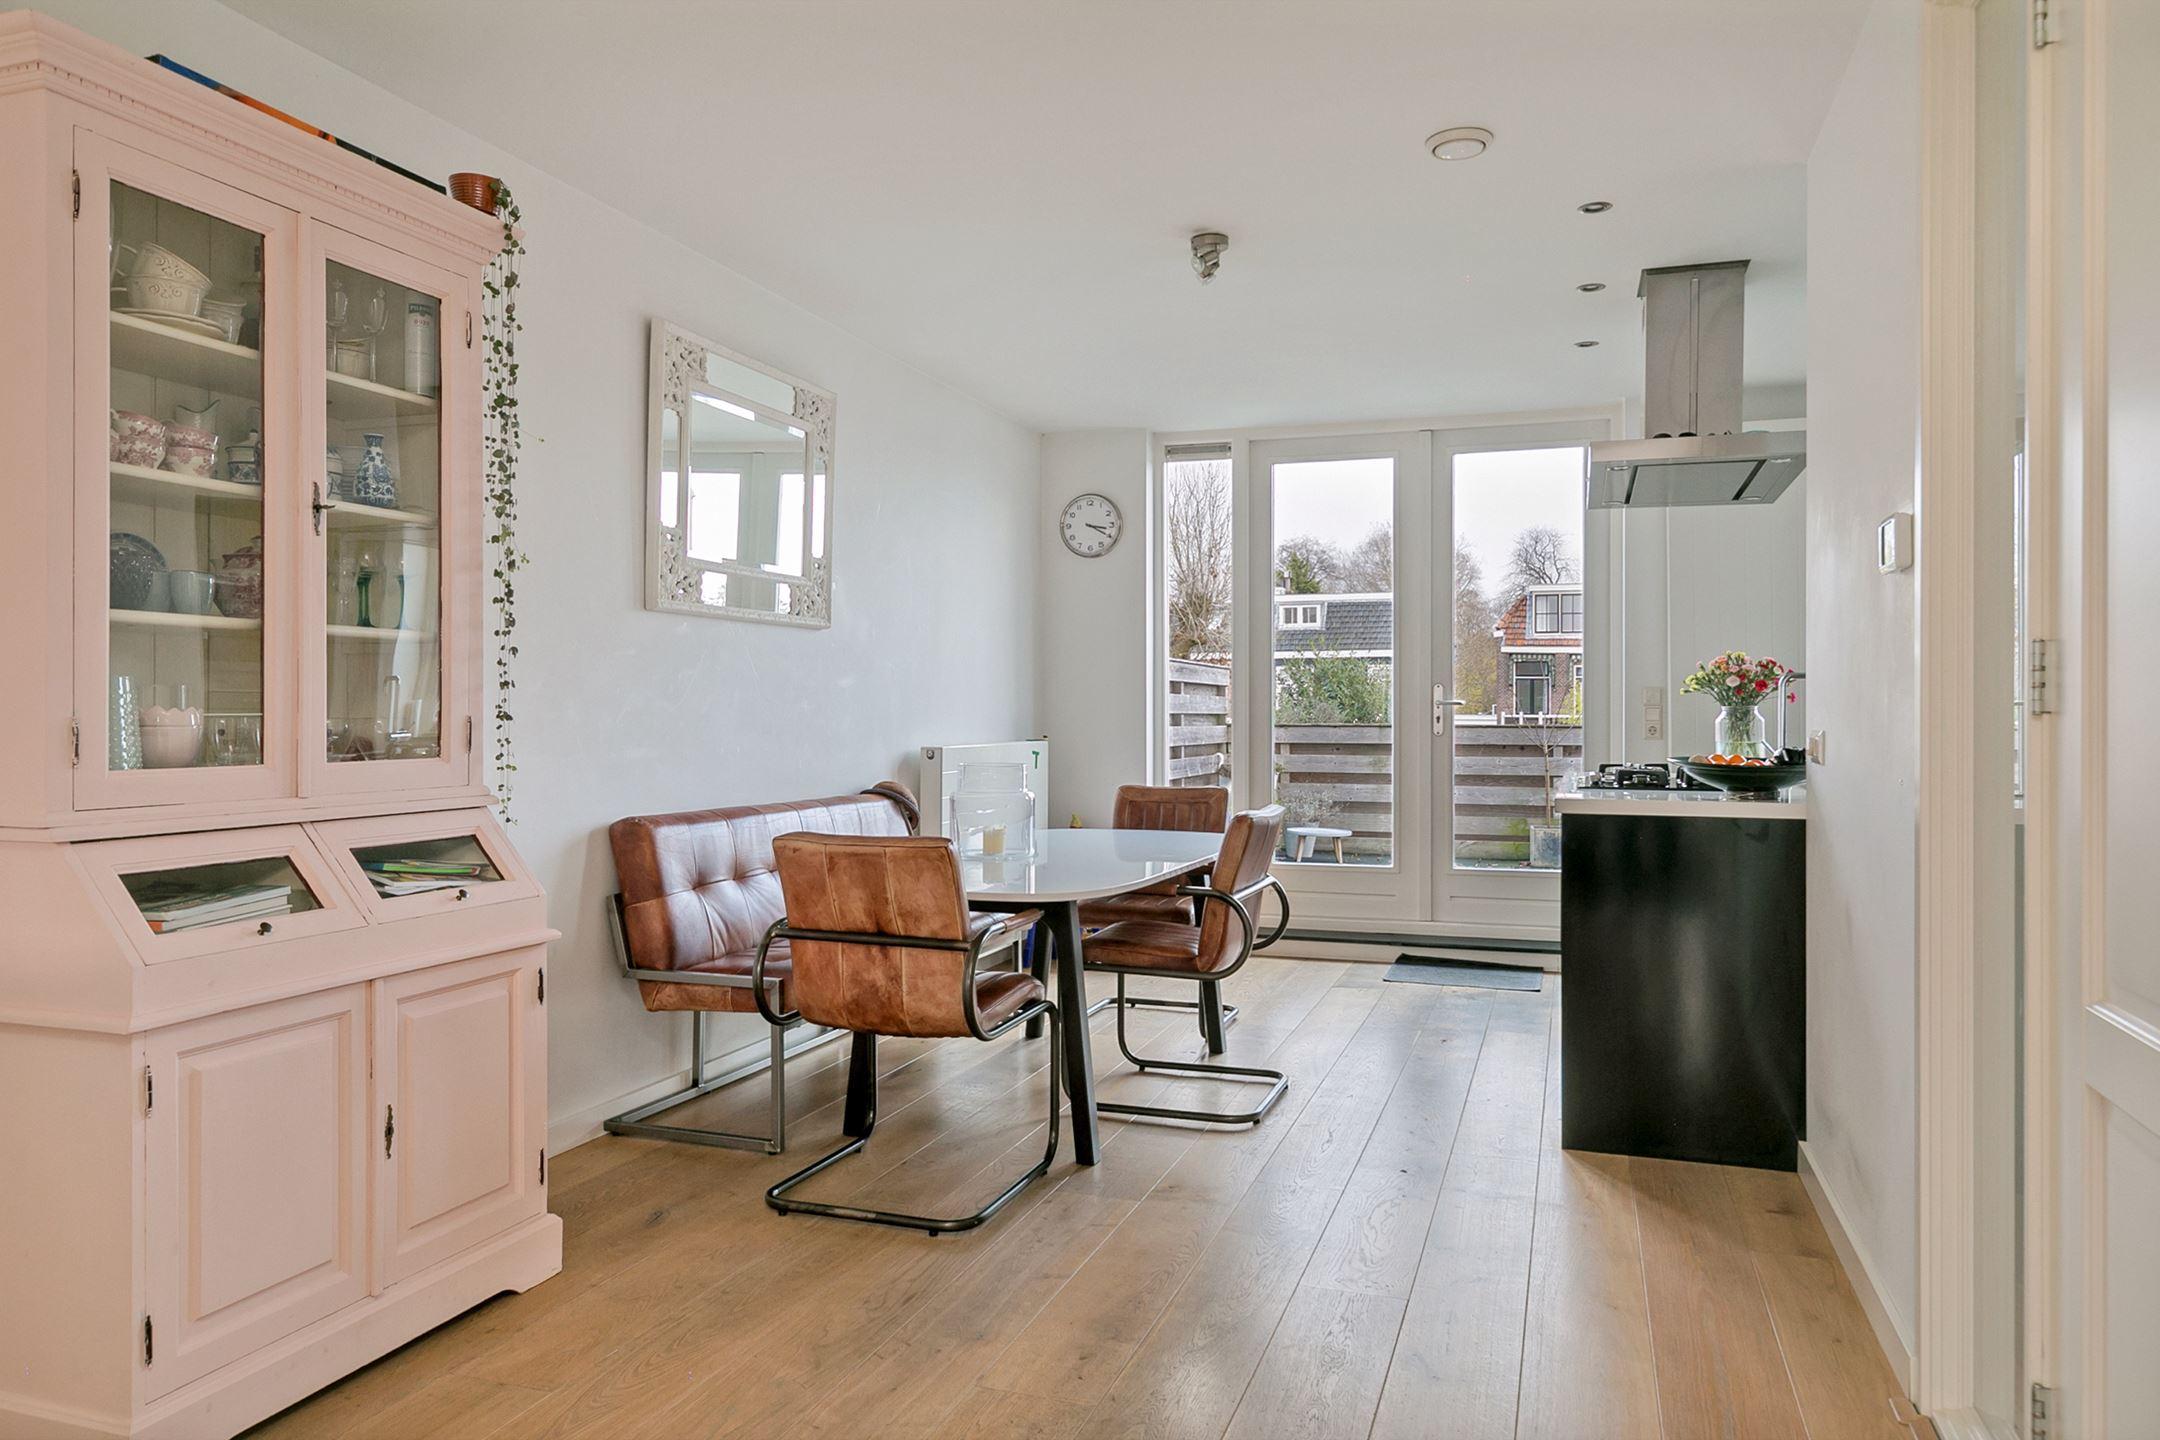 Appartement te koop: emmaweg 56 3603 an maarssen [funda]